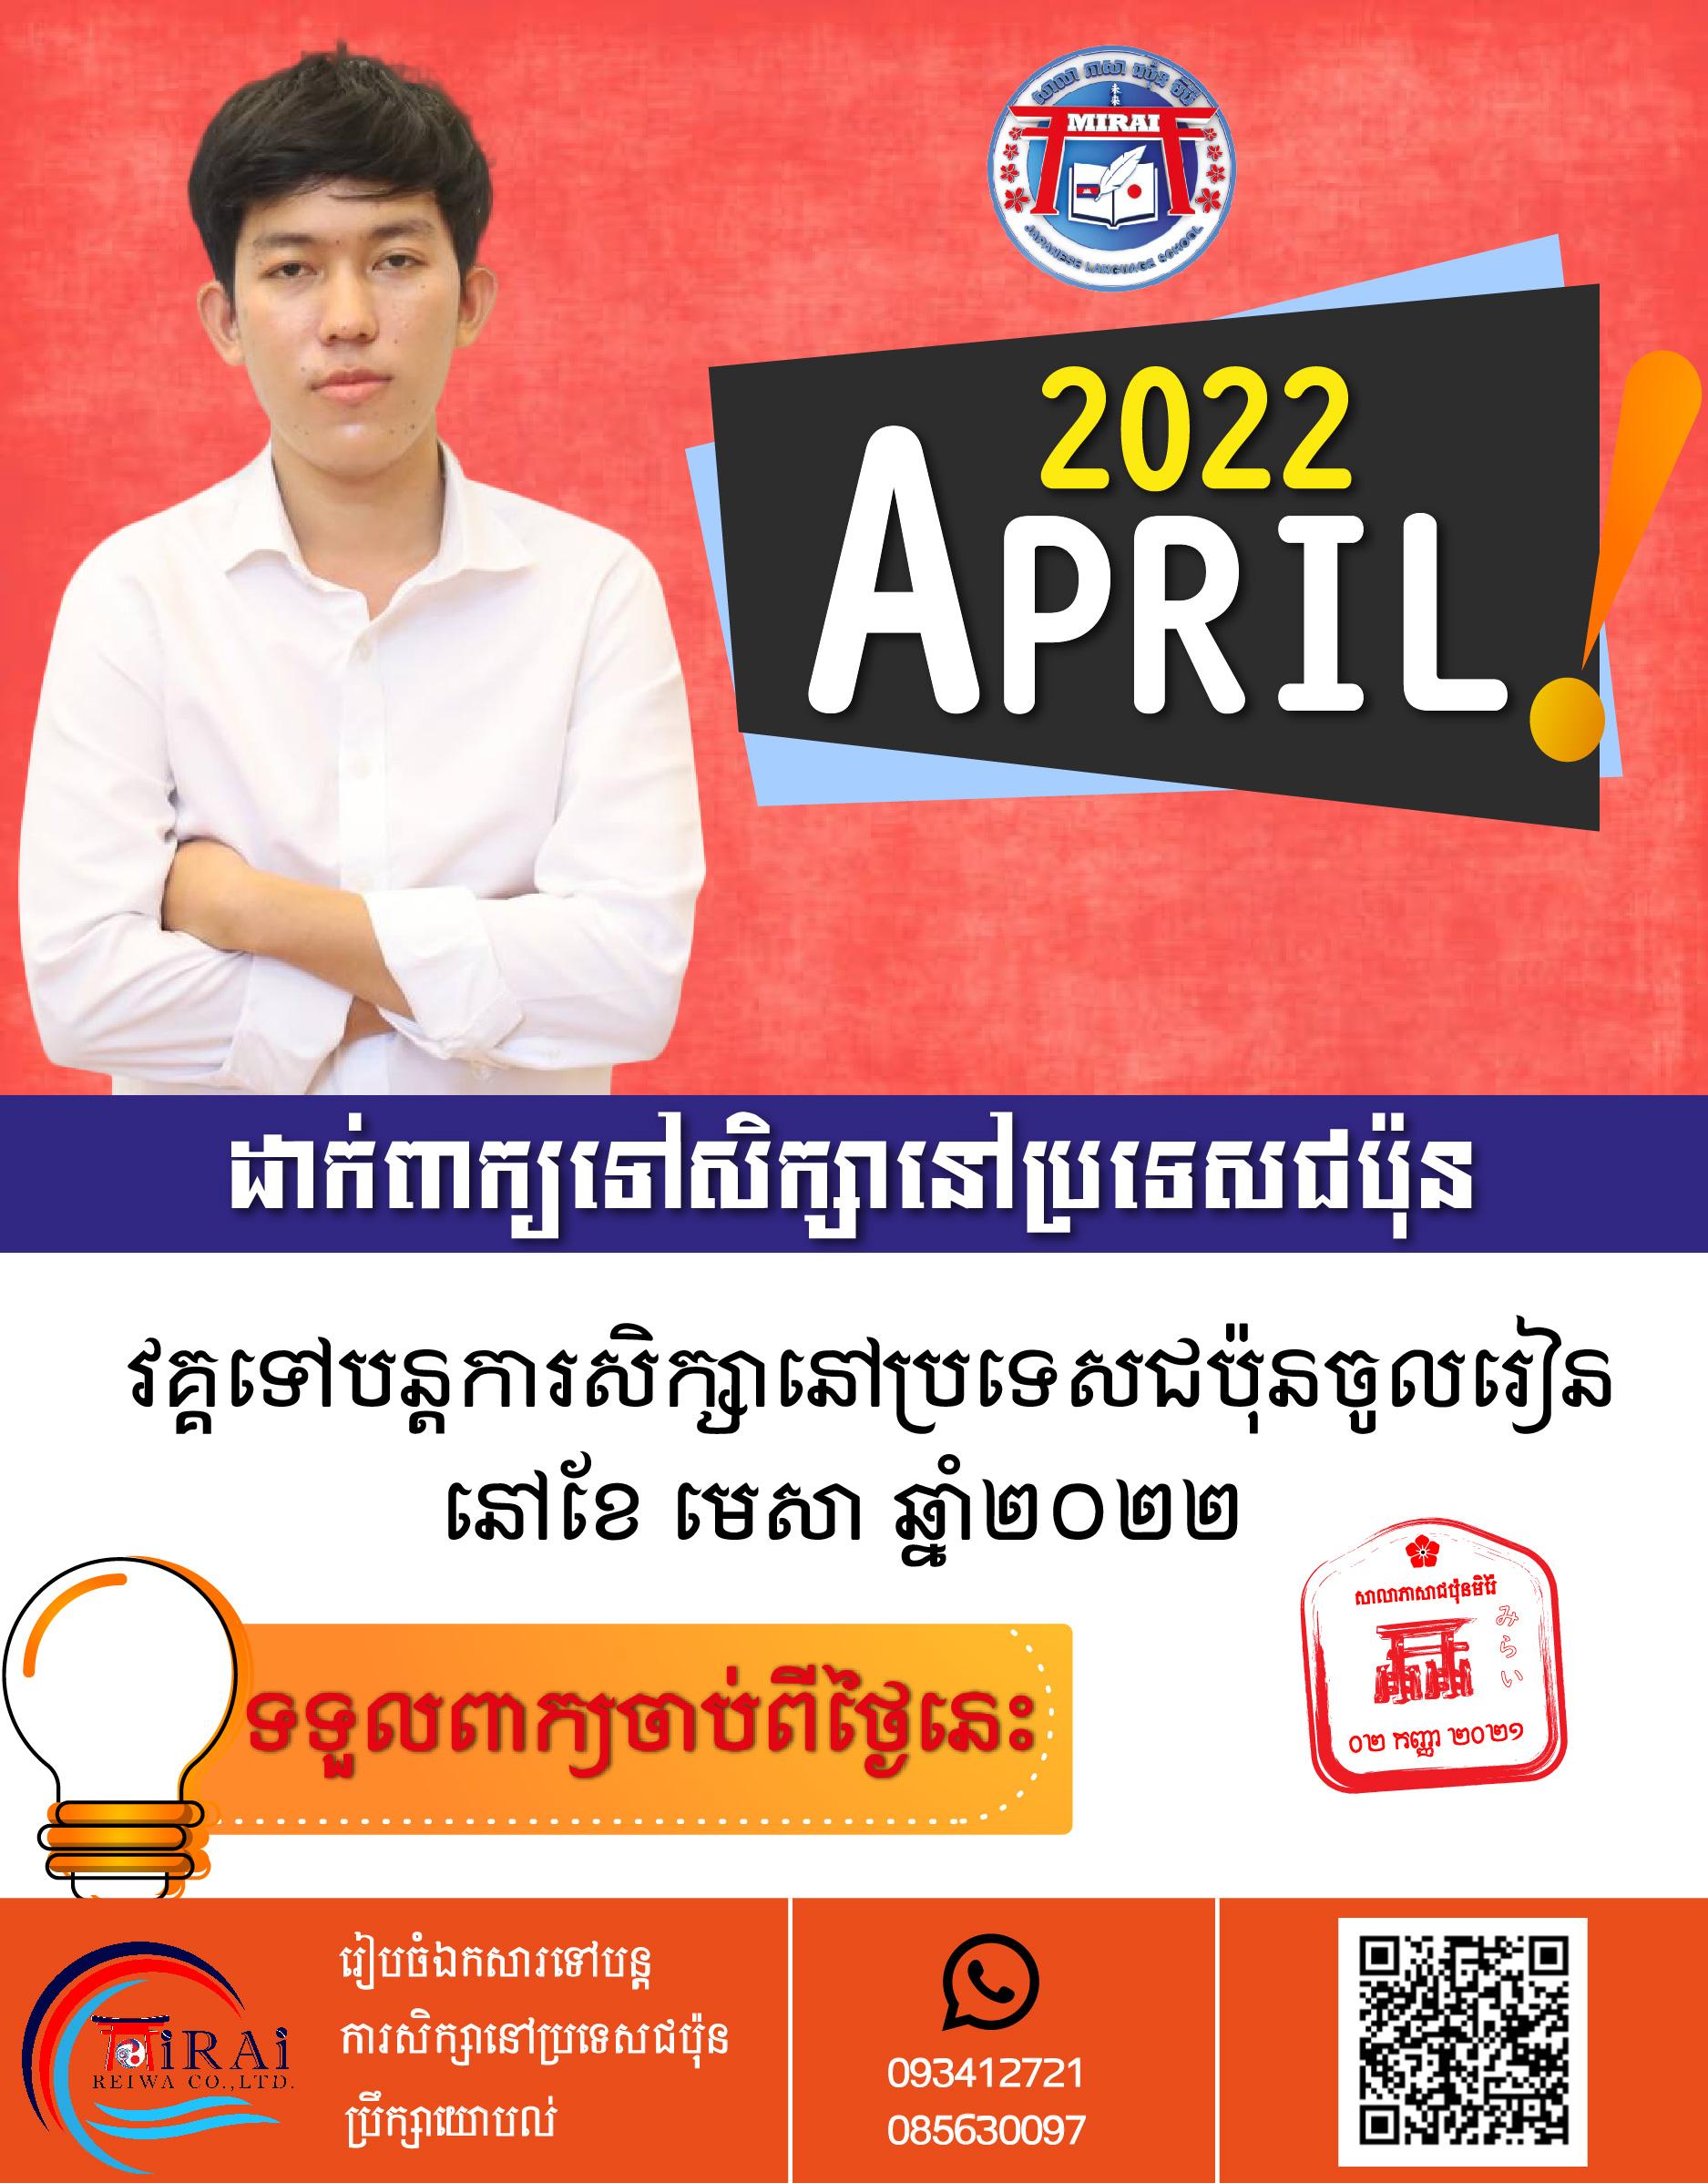 Study Abroad New Term (April 2022)